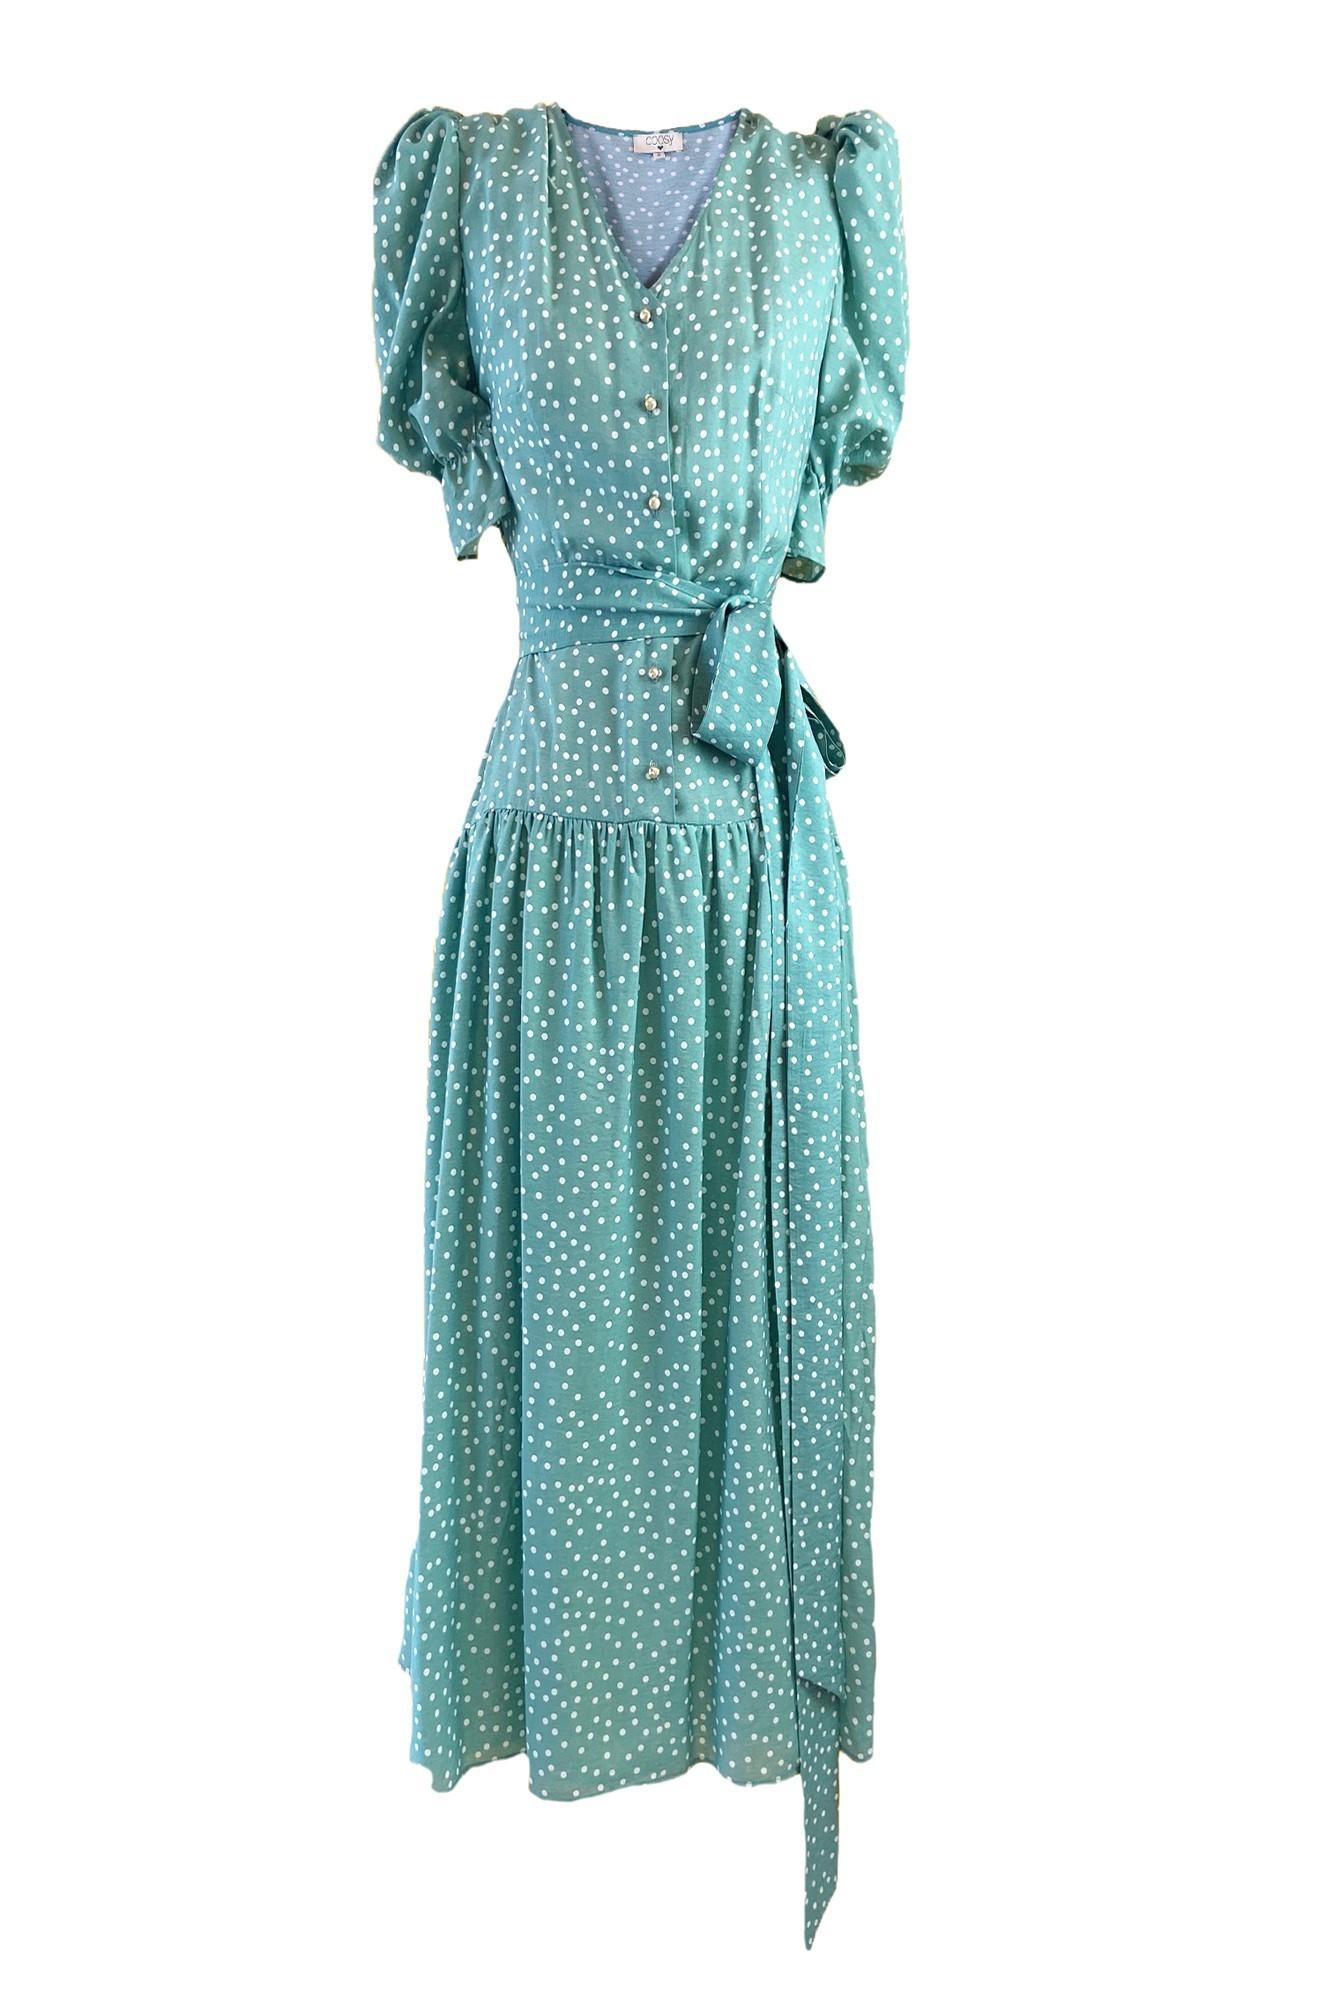 MARTHA GREEN DRESS